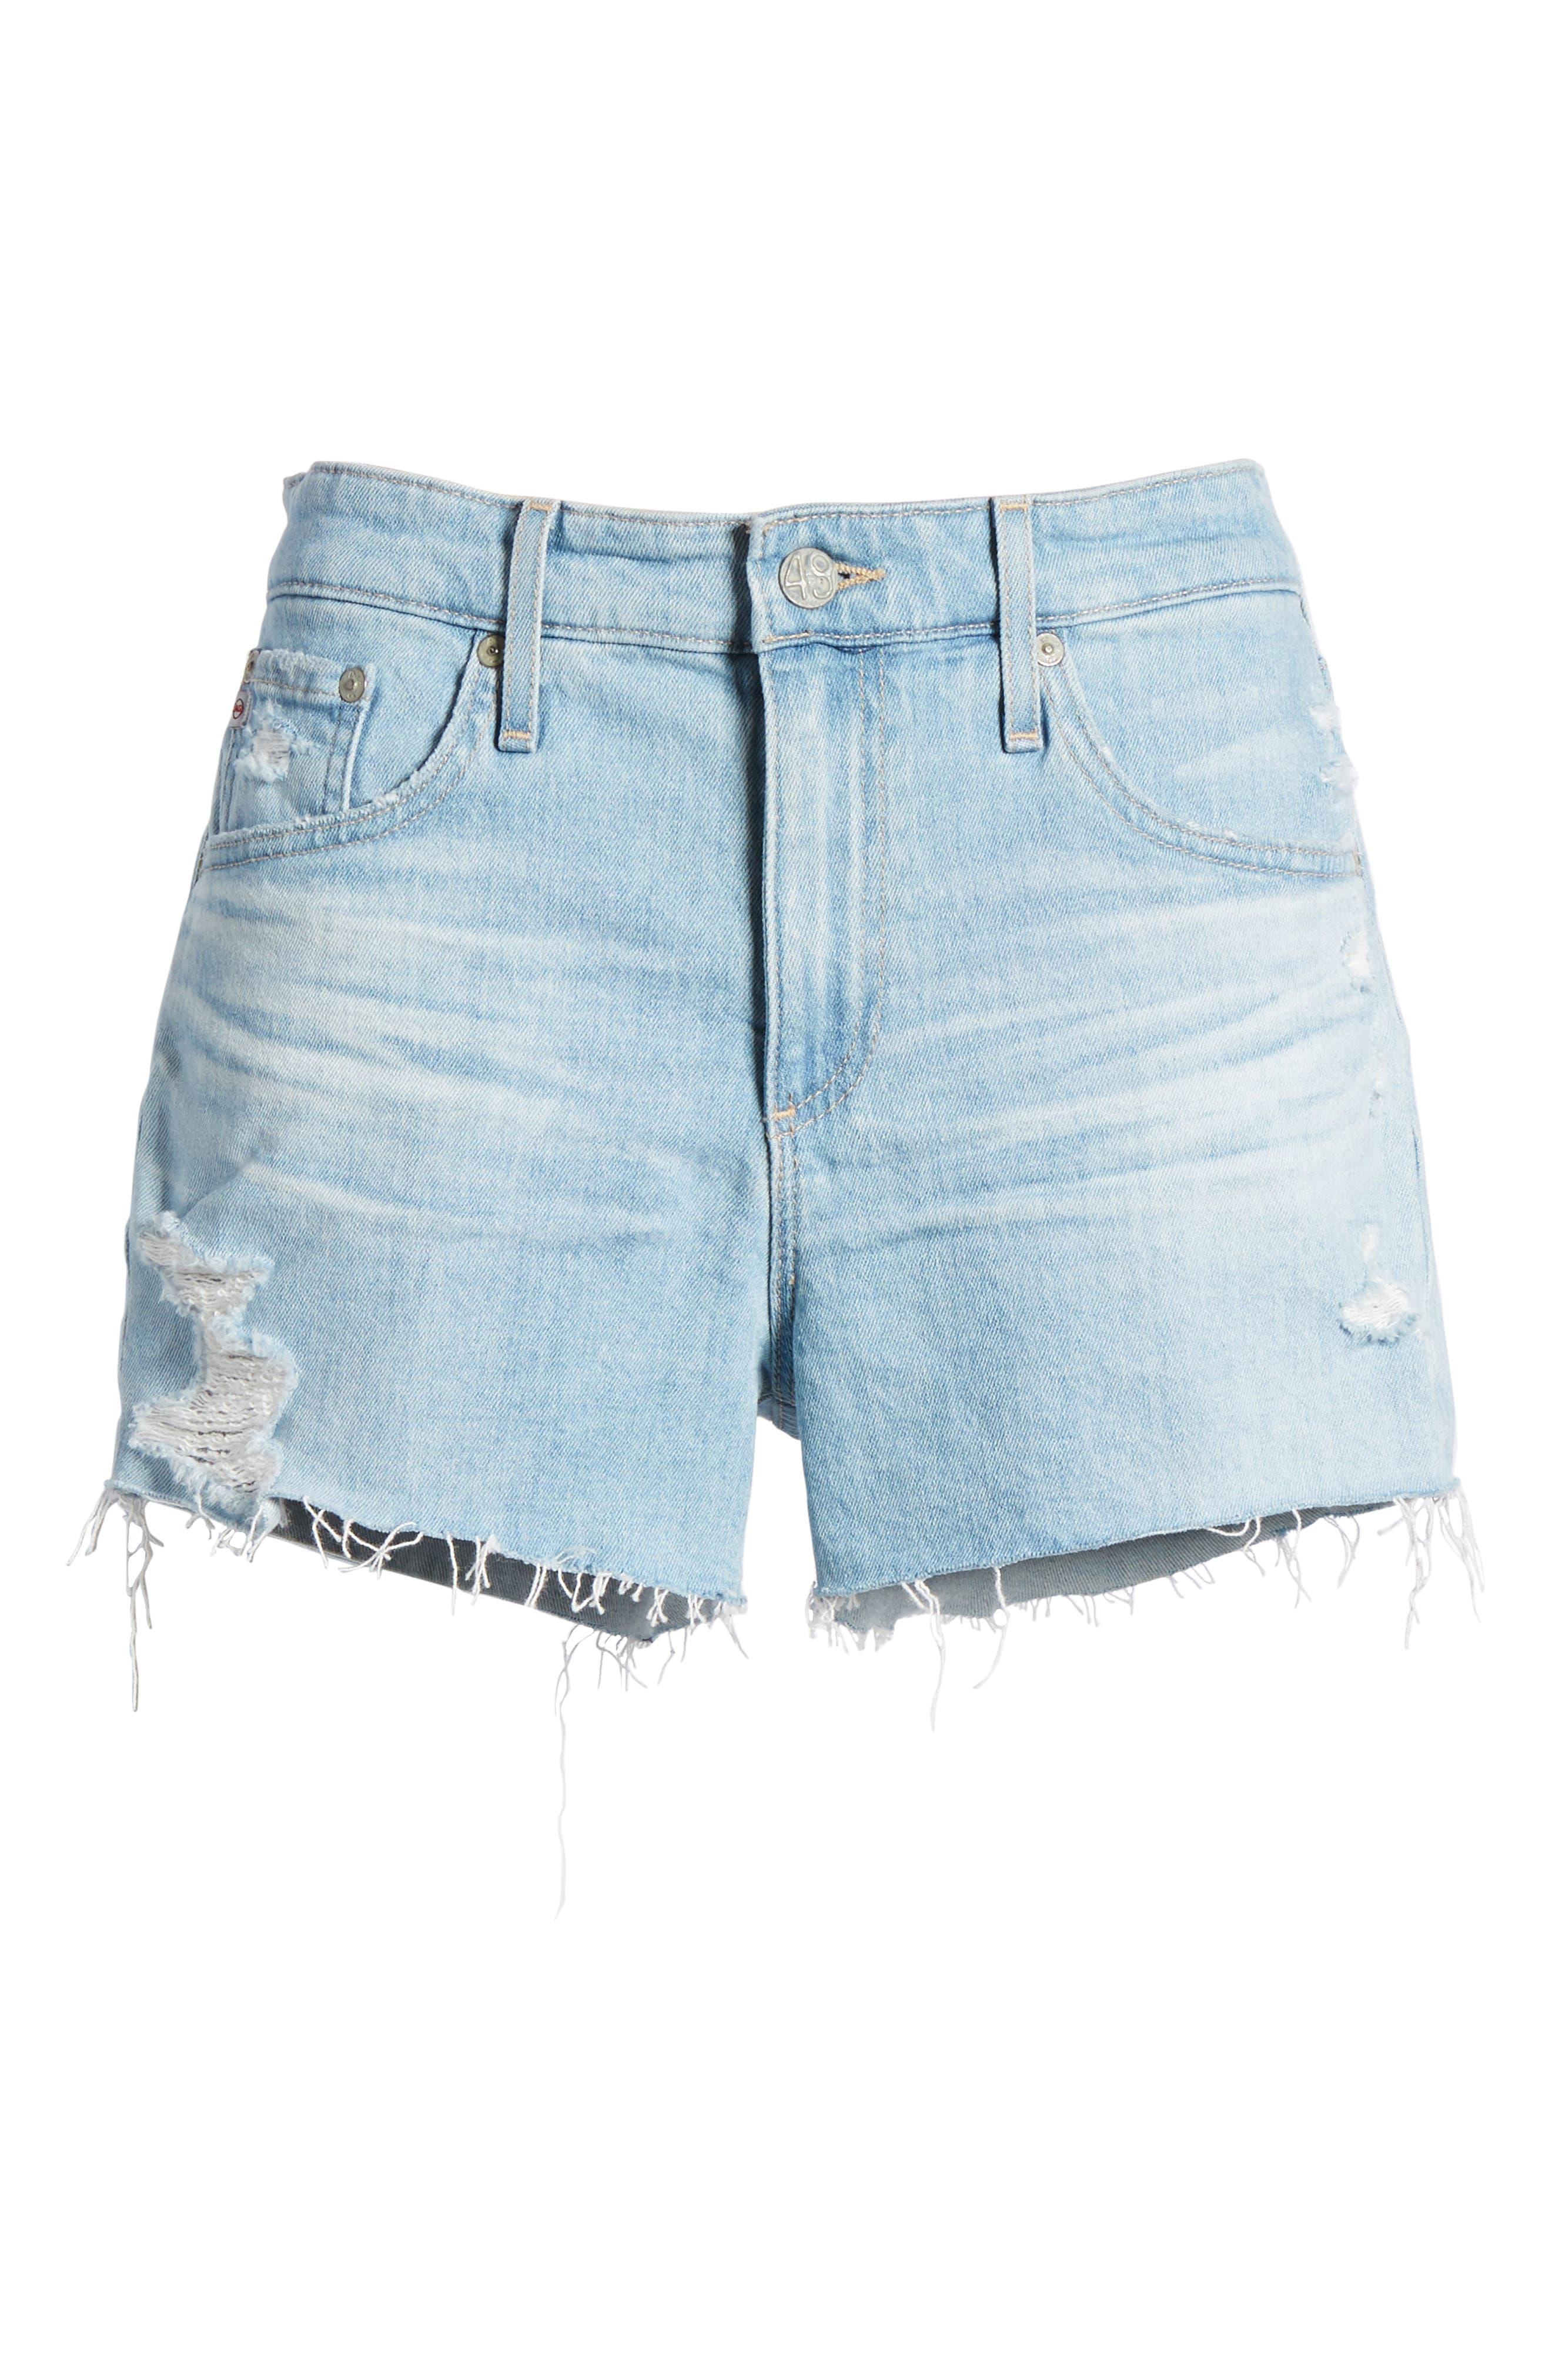 Bryn High Waist Cutoff Denim Shorts,                             Alternate thumbnail 7, color,                             426